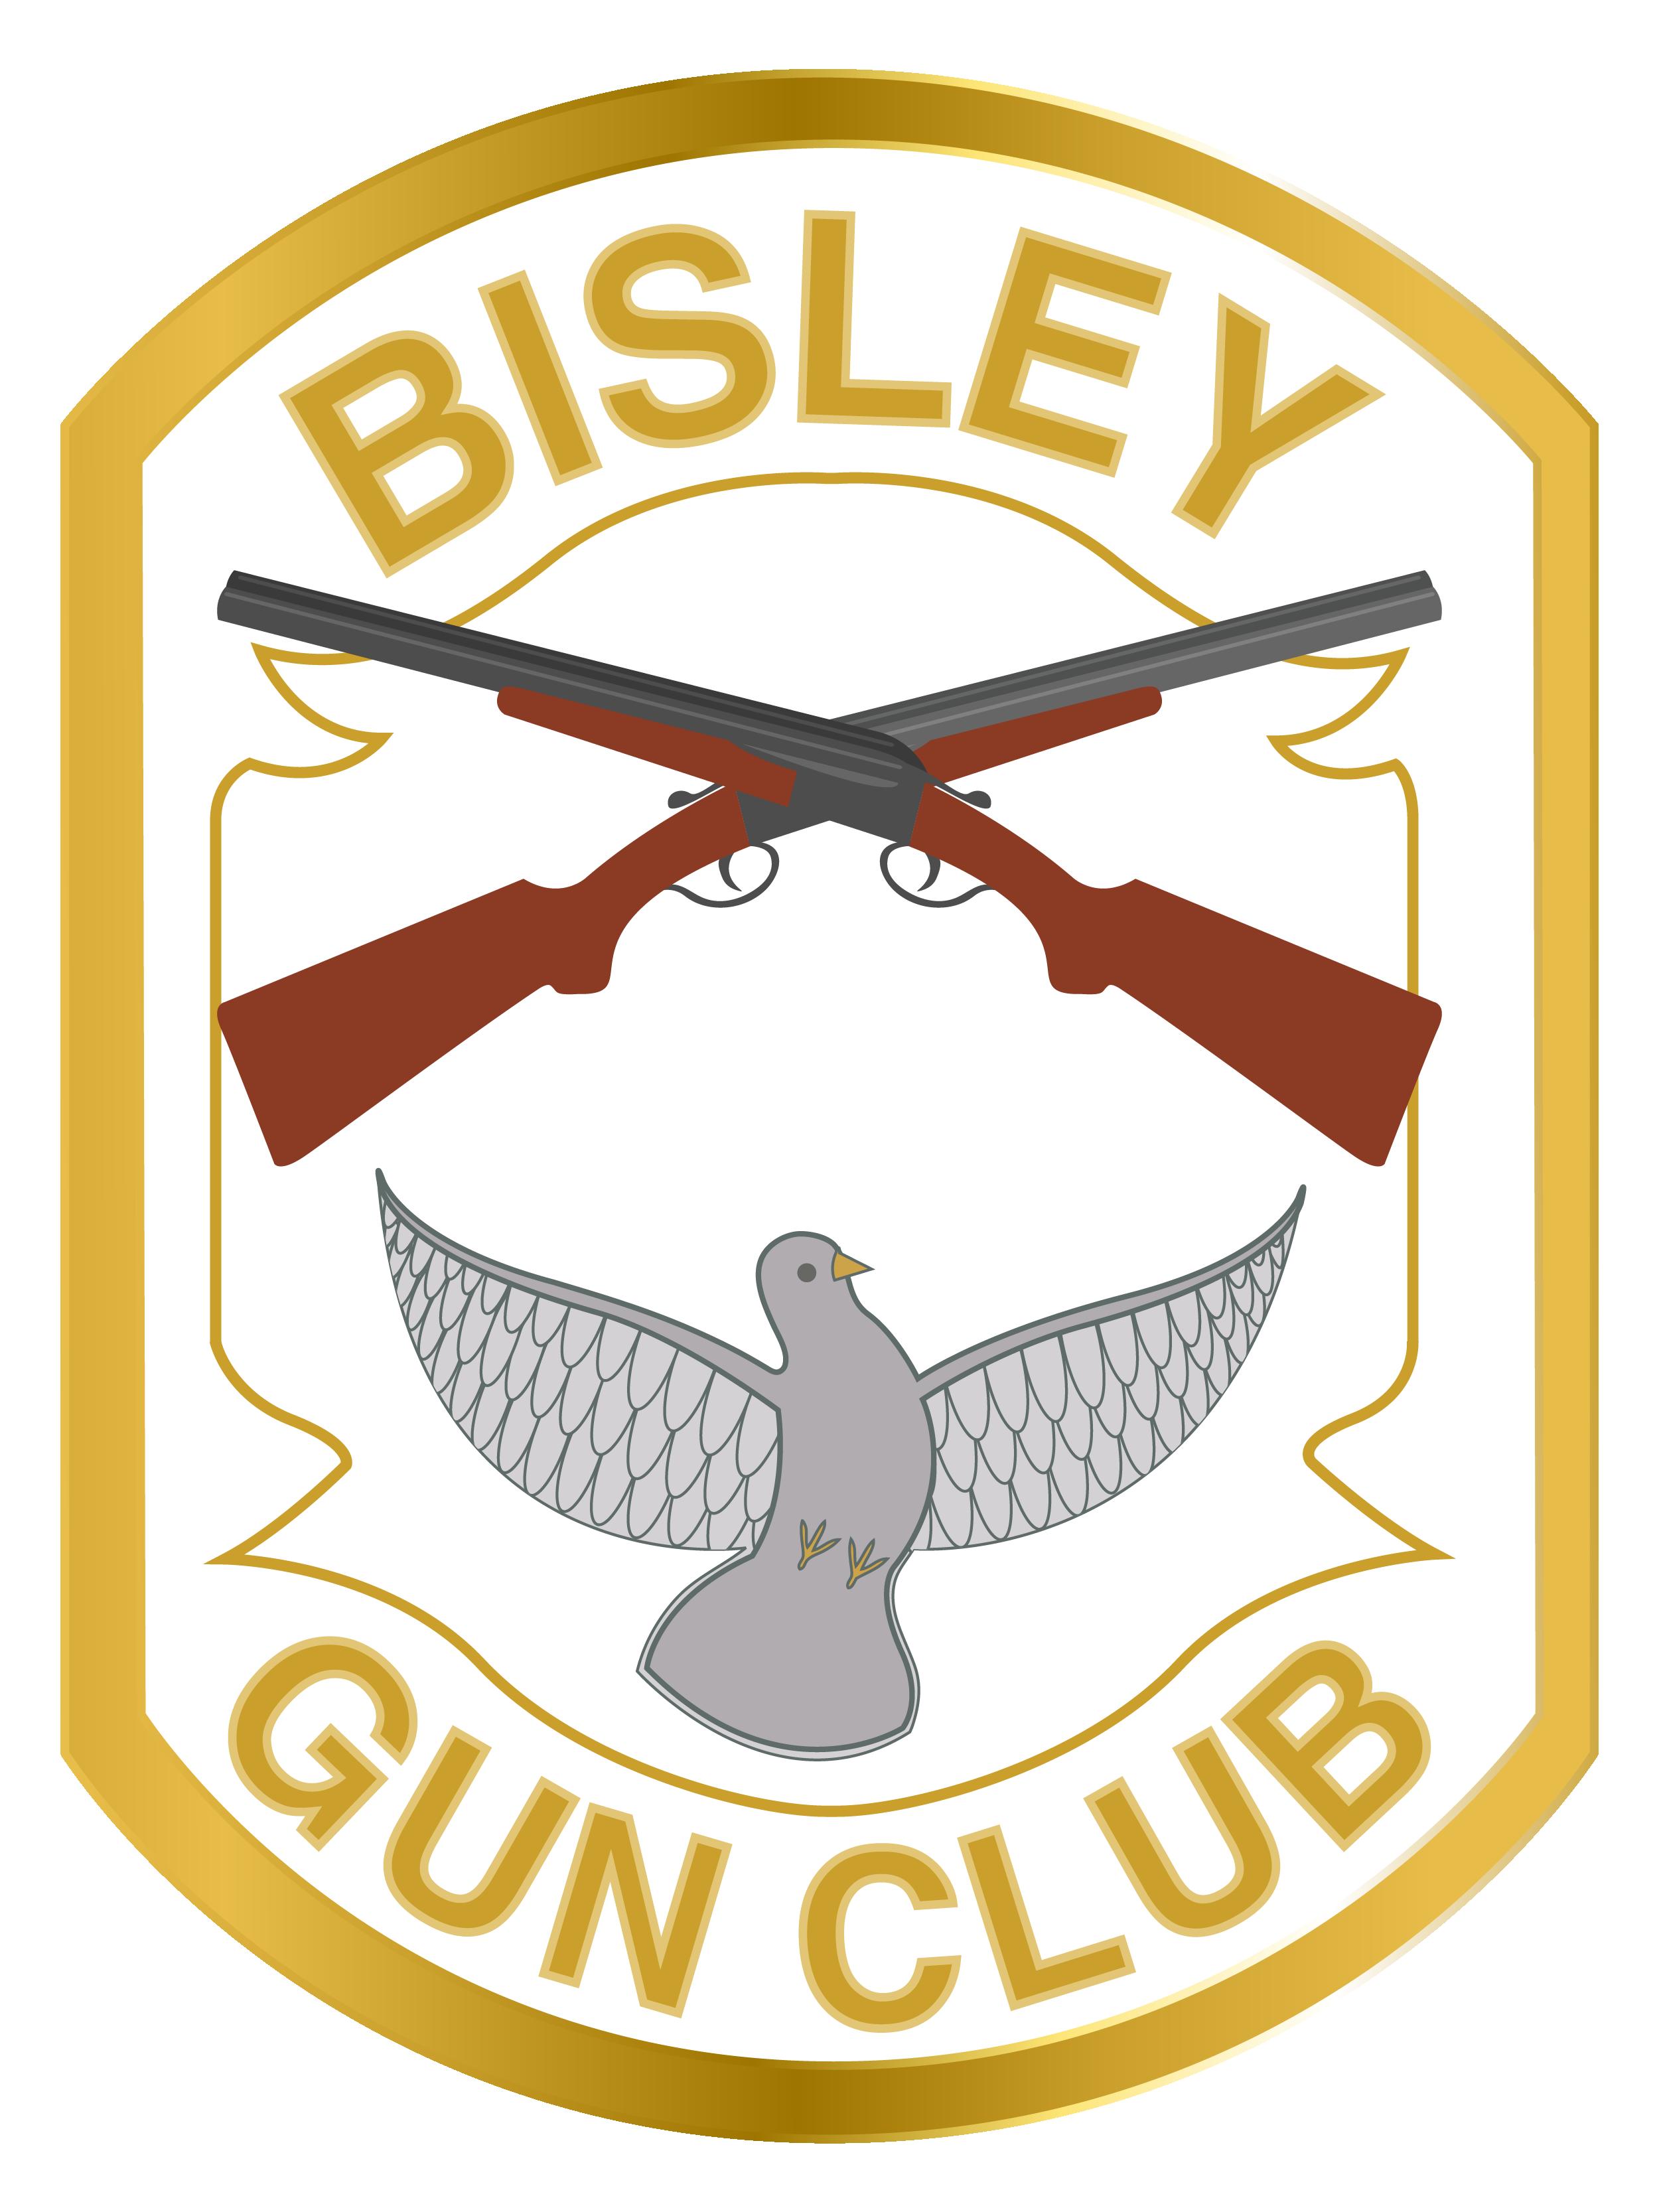 The Bisley Gun Club